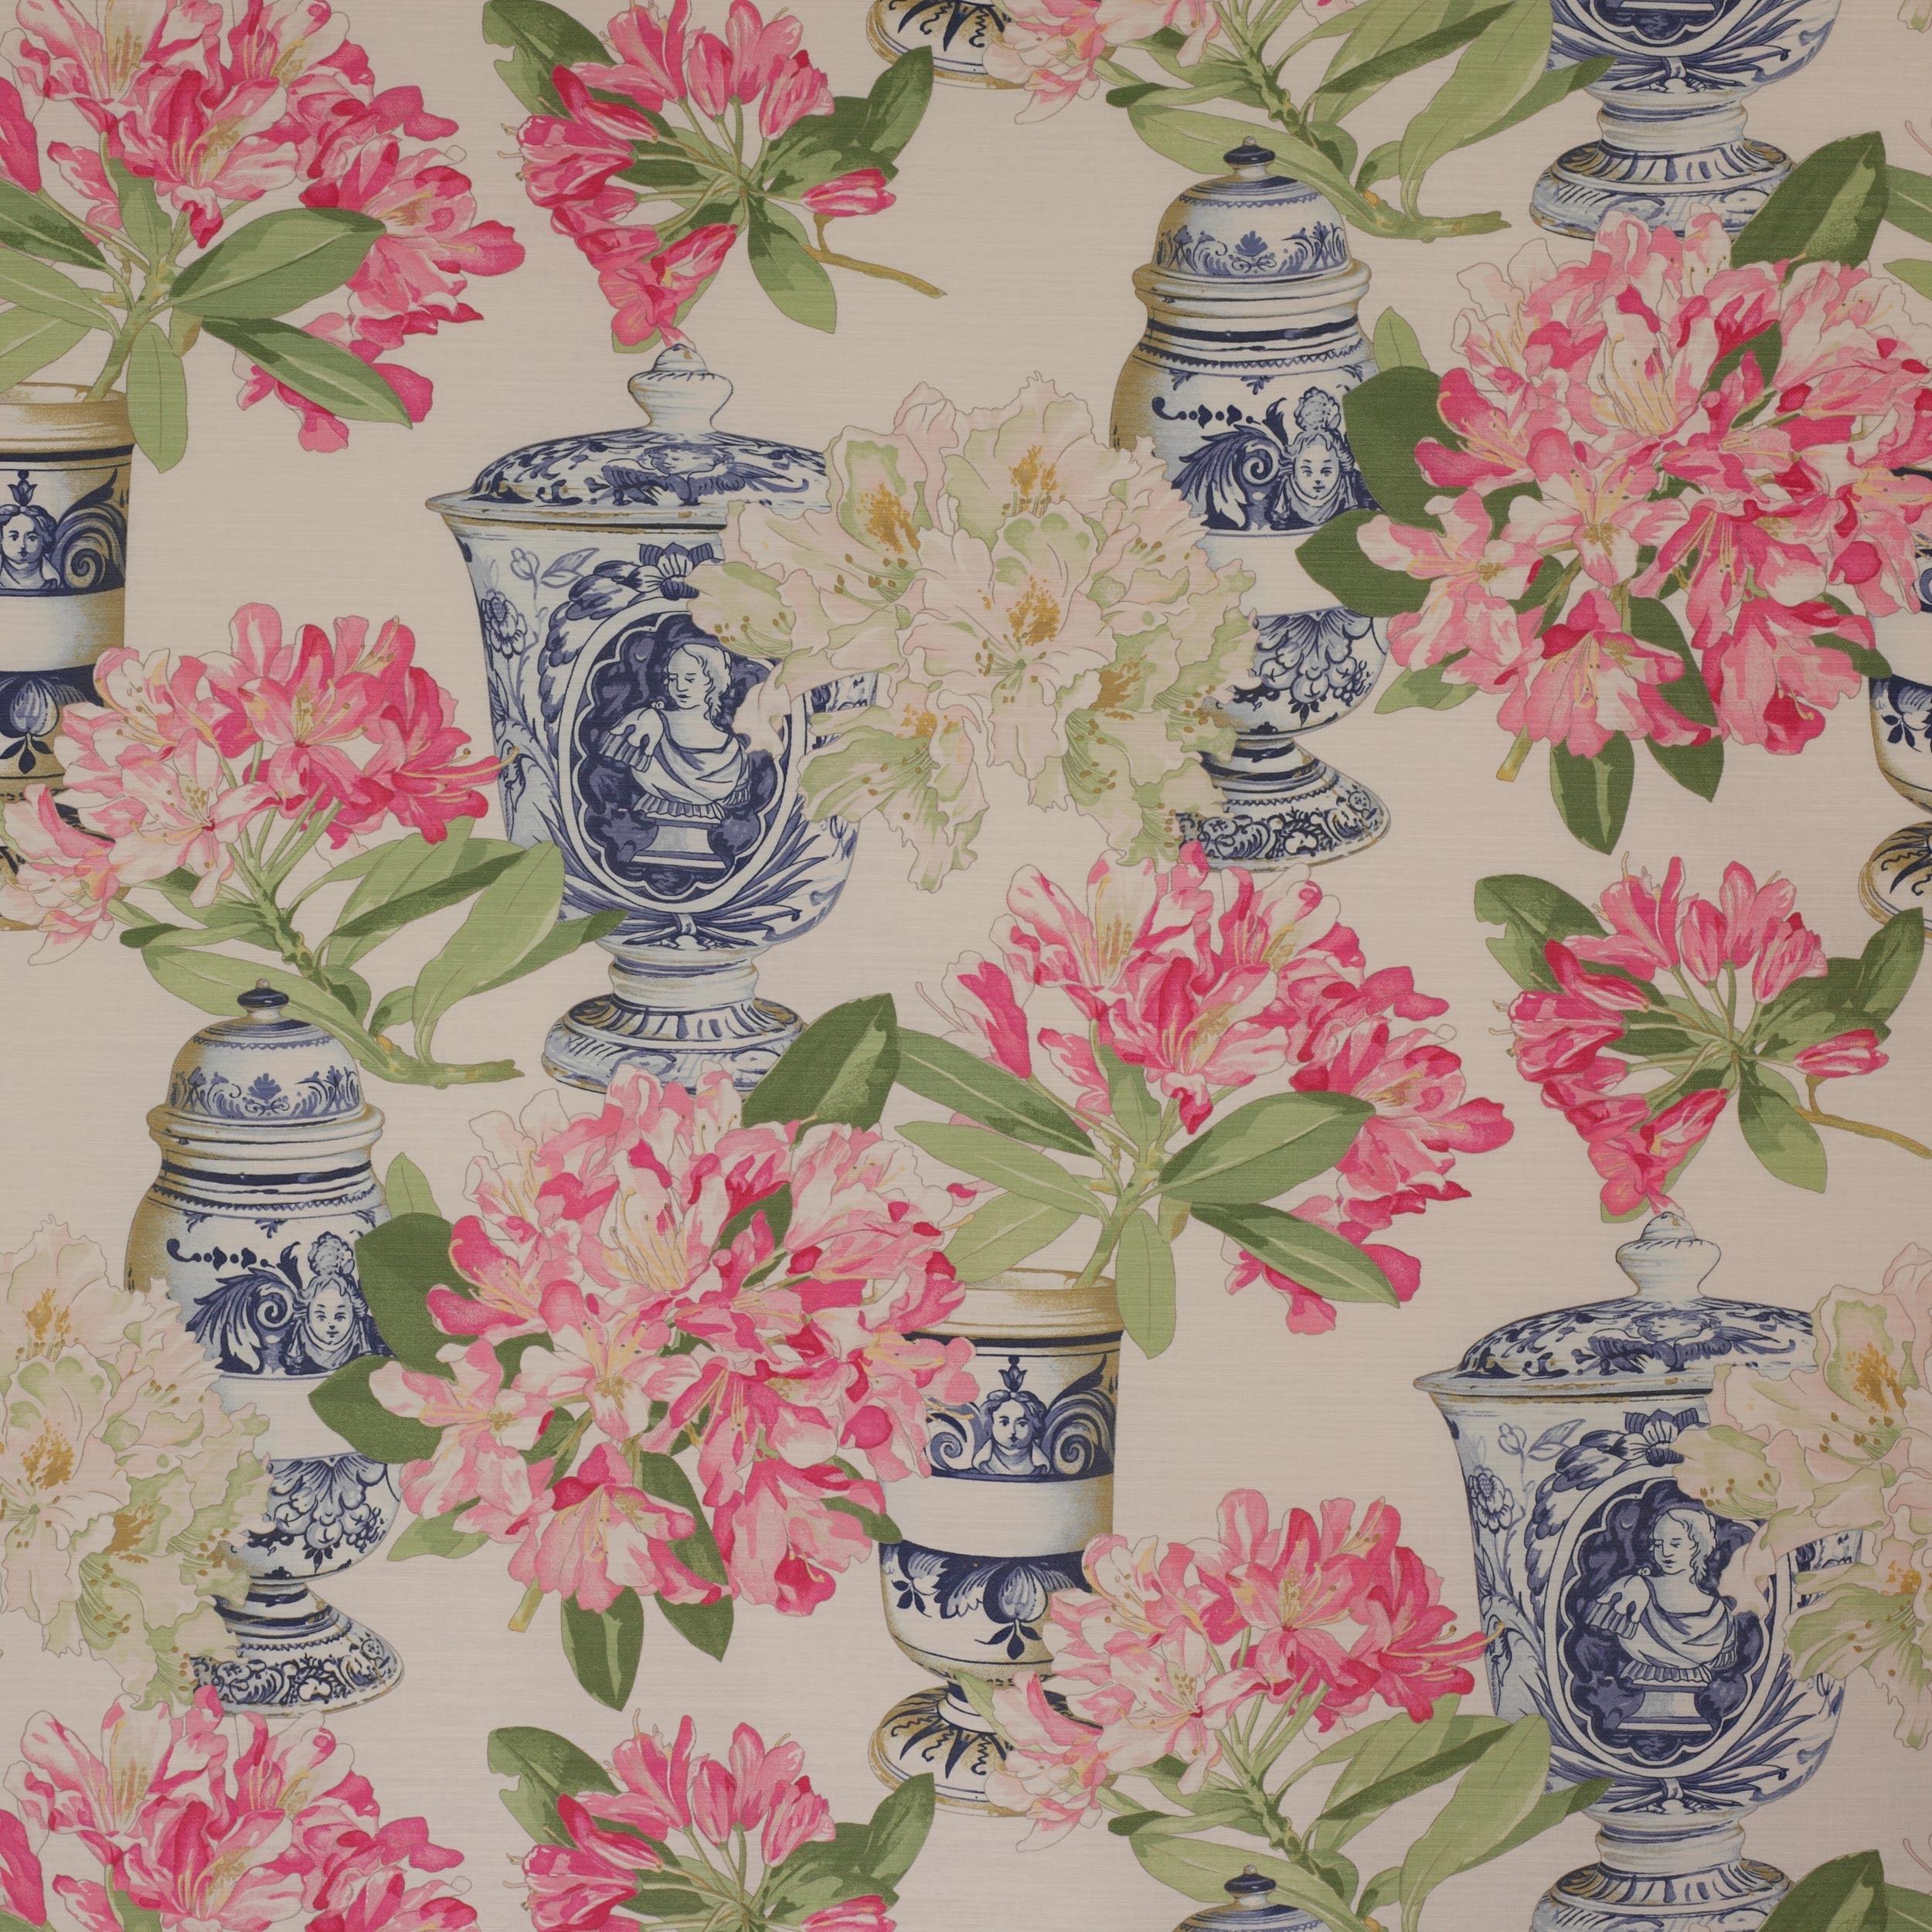 tissu-vase-fleurs-manuel-canovas-bragance-rose.